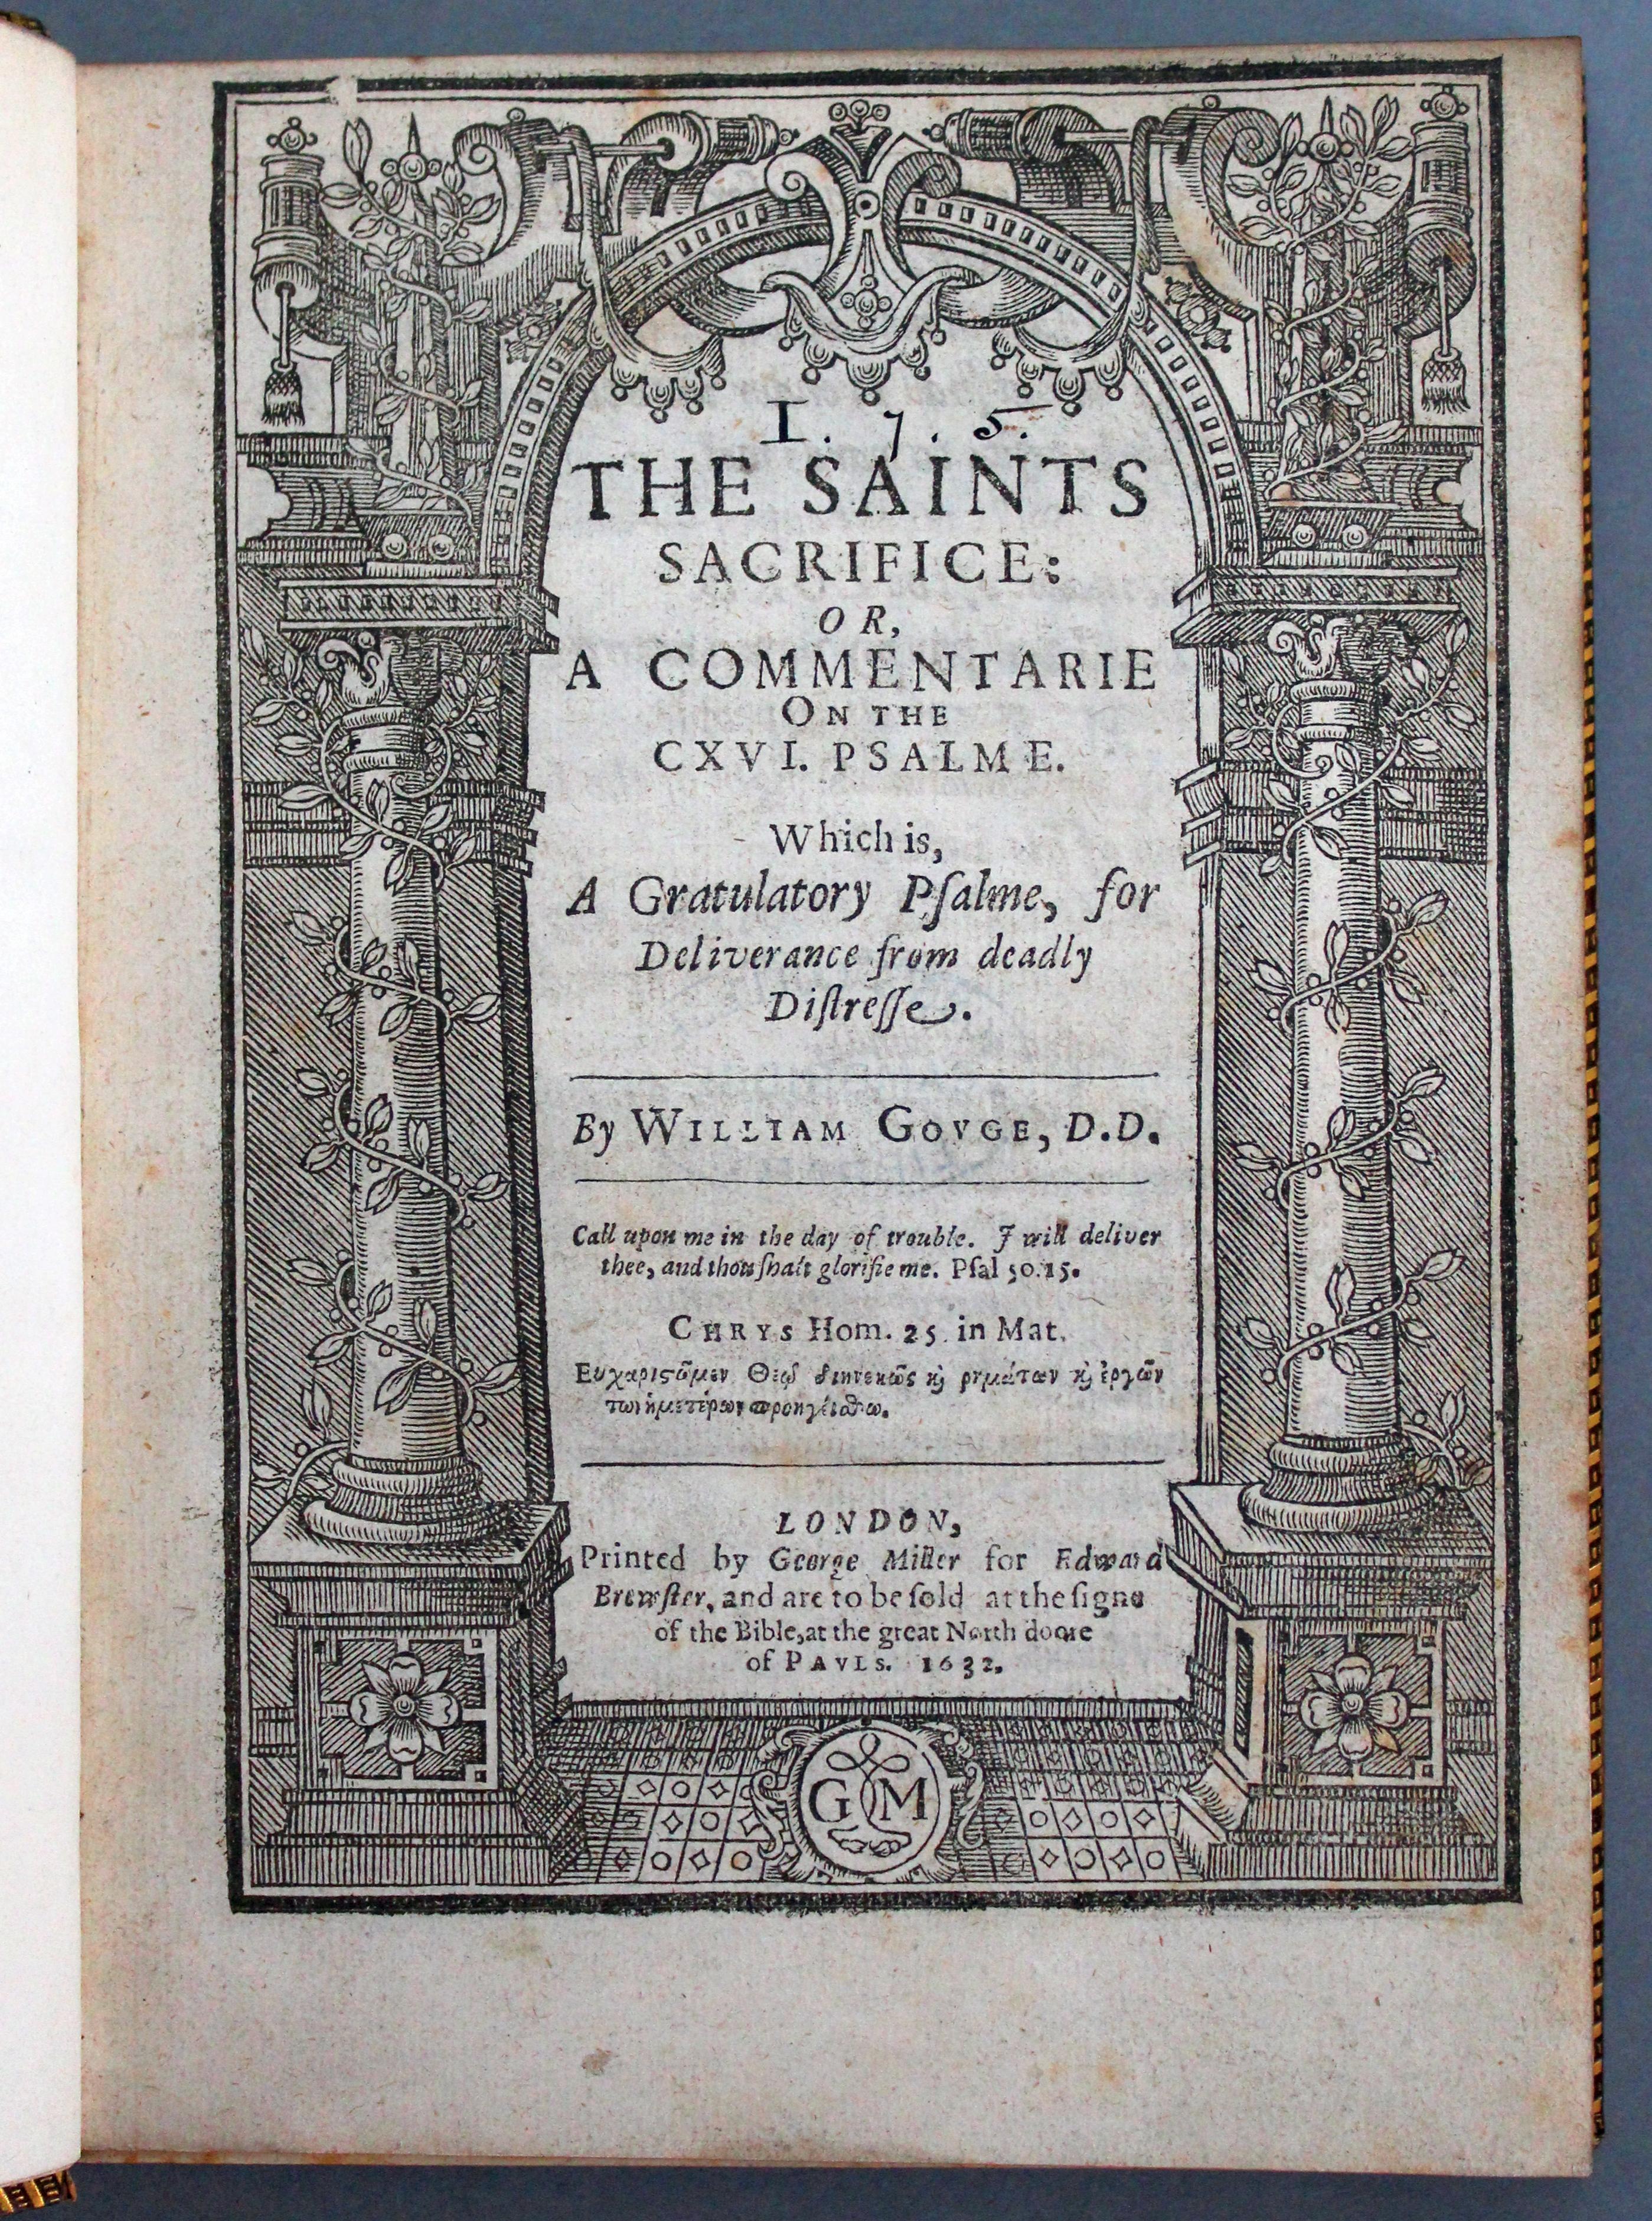 Thackeray.I.7.5_title page